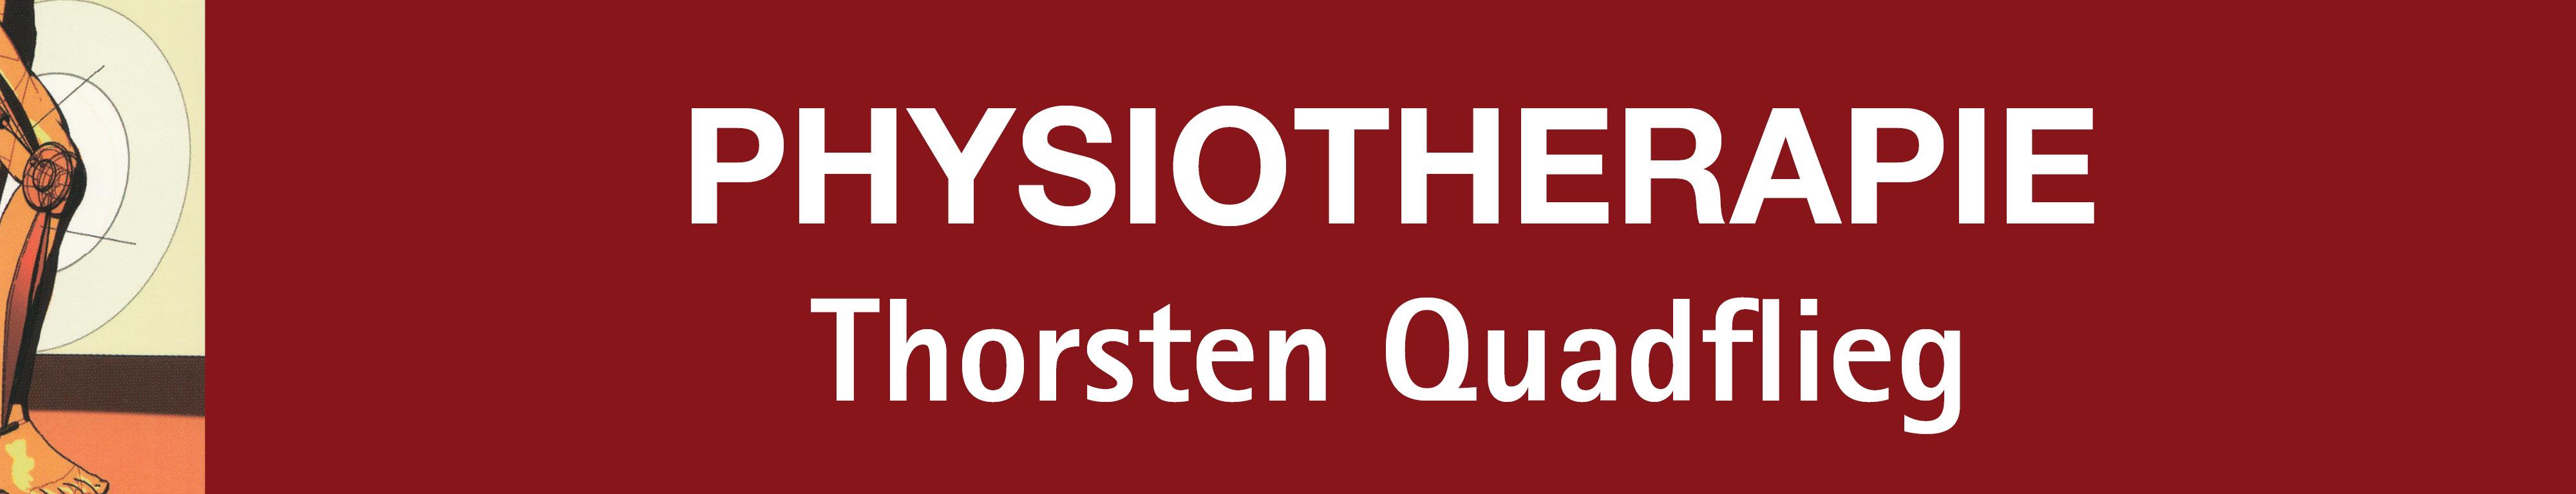 Physiotherapie Thorsten Quadflieg